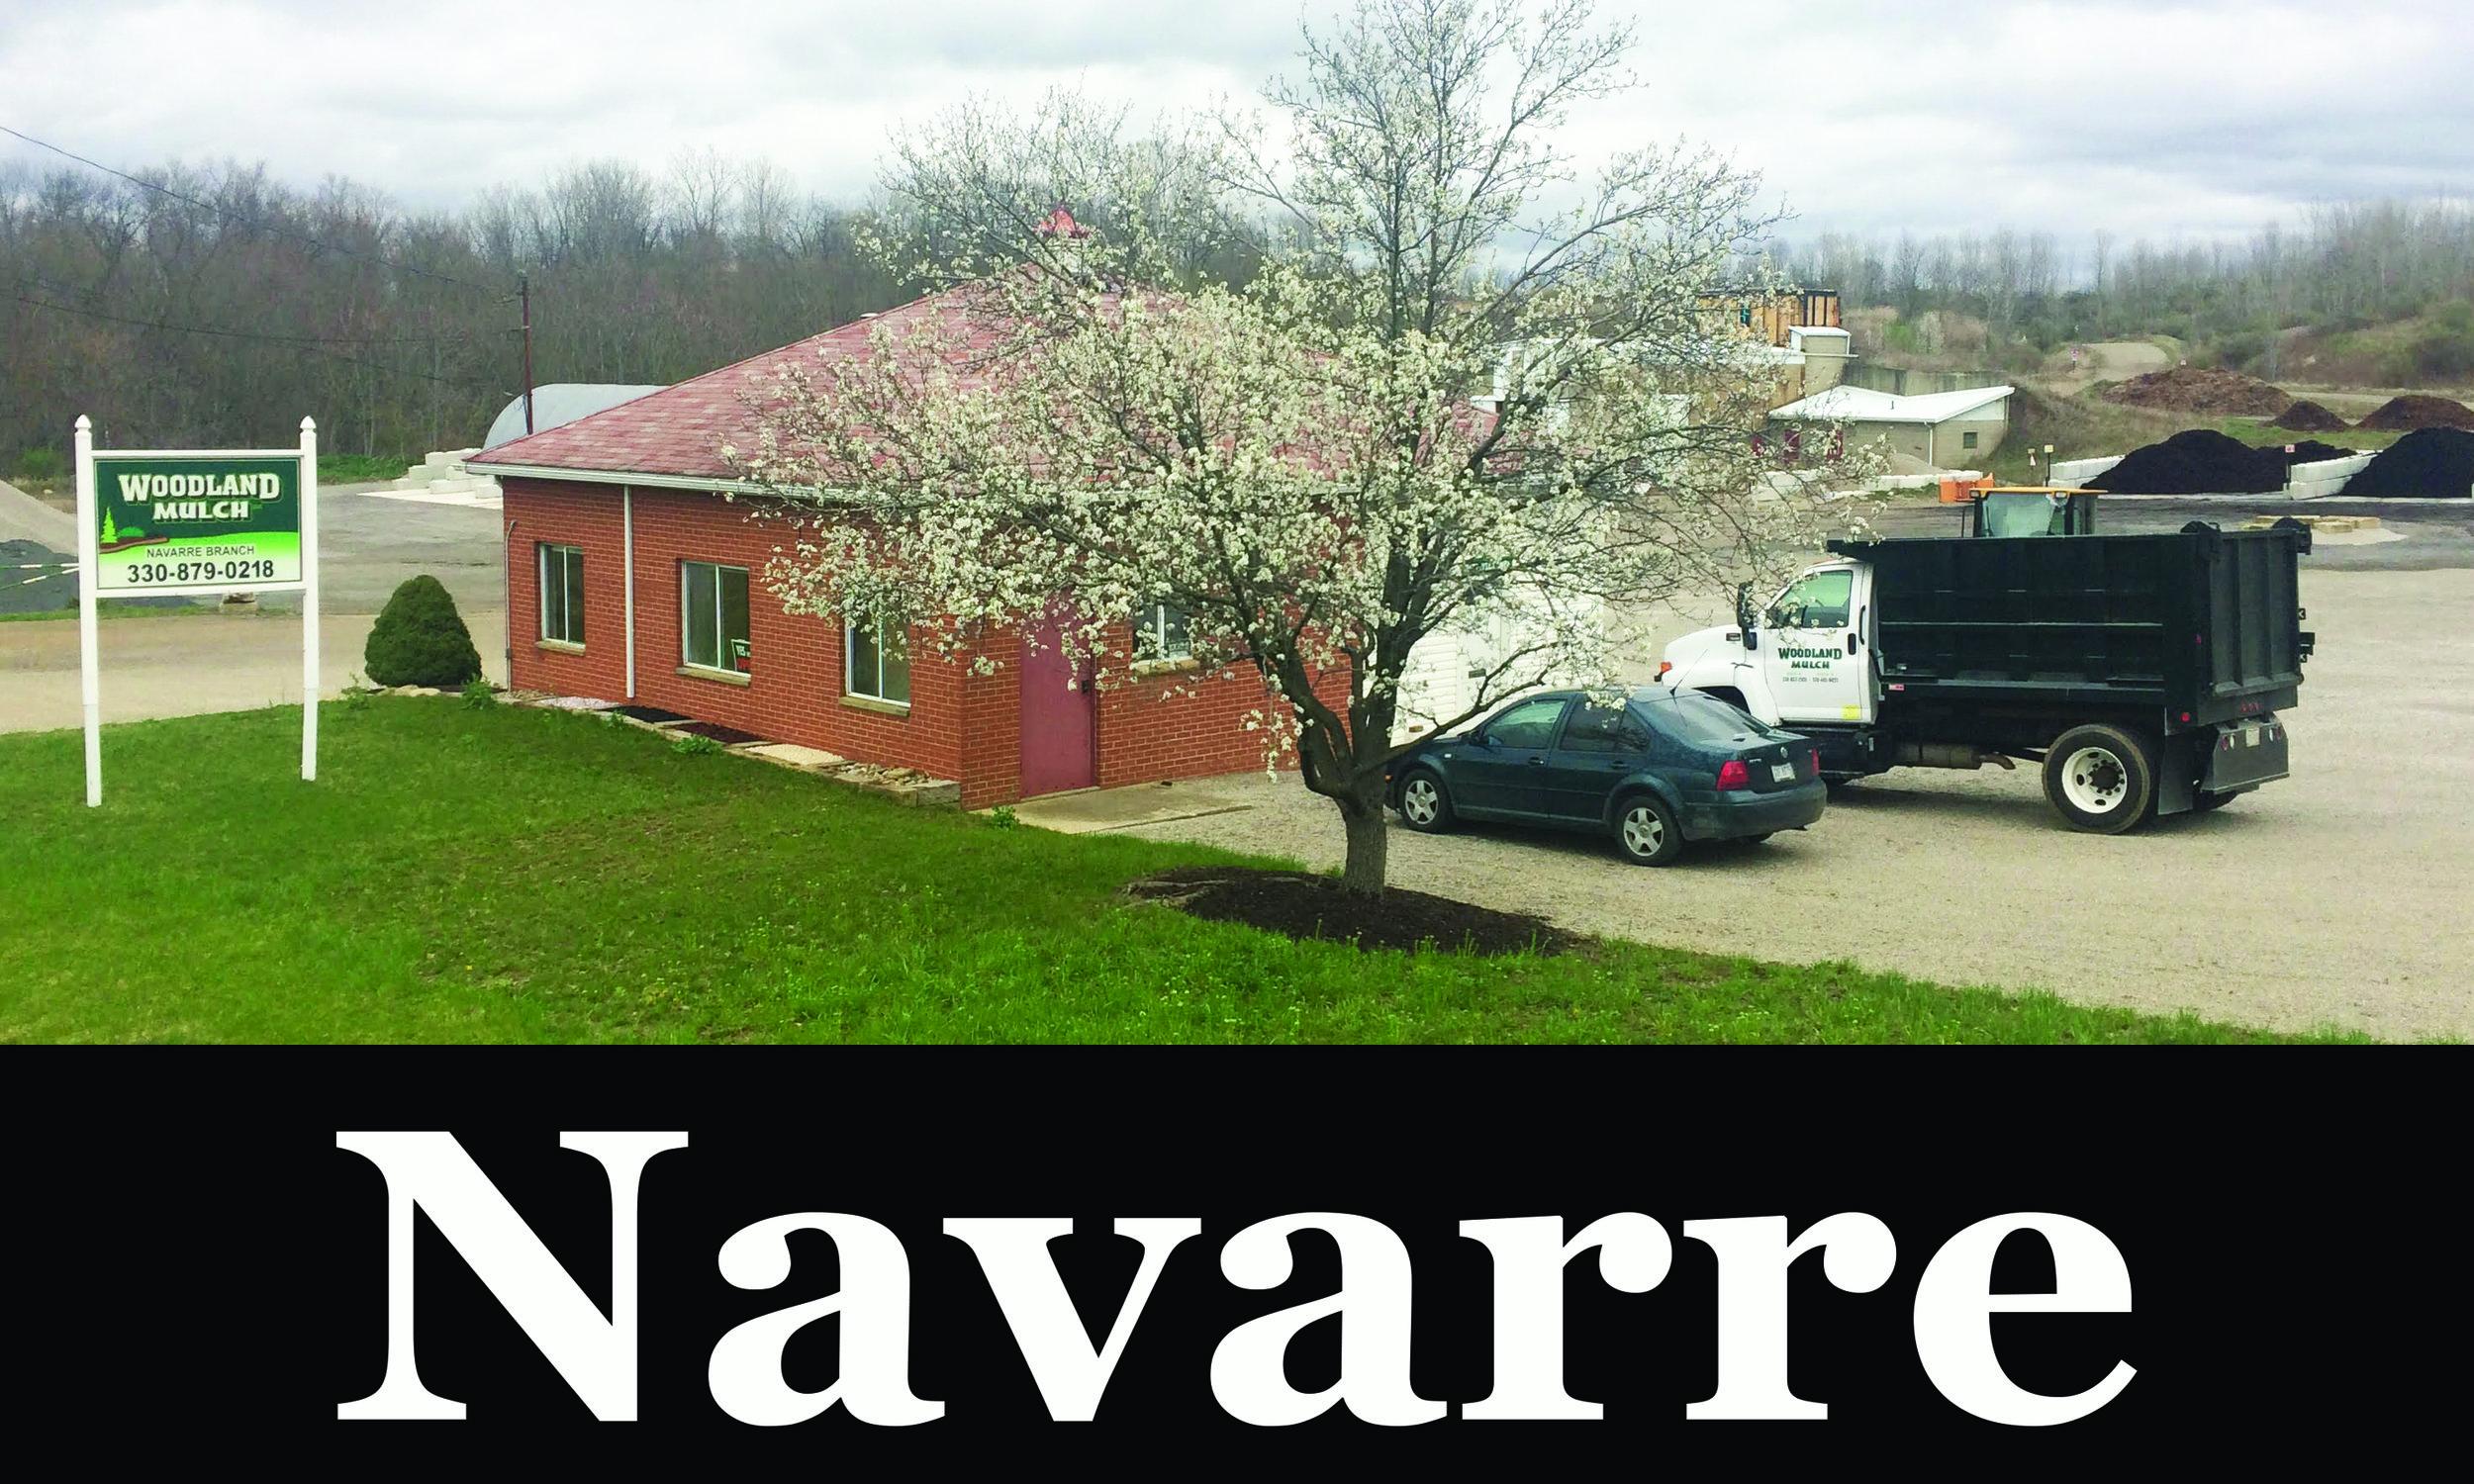 Woodland Mulch in Navarre Ohio